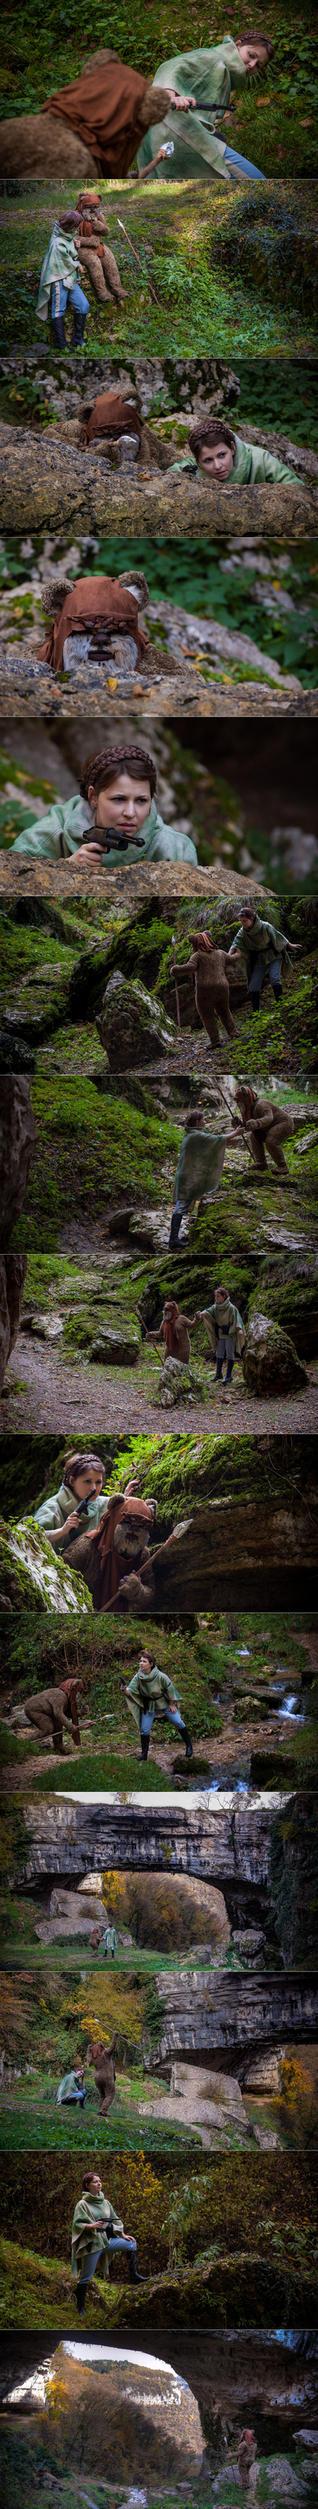 Leia meets Wicket by daguerreoty-pe